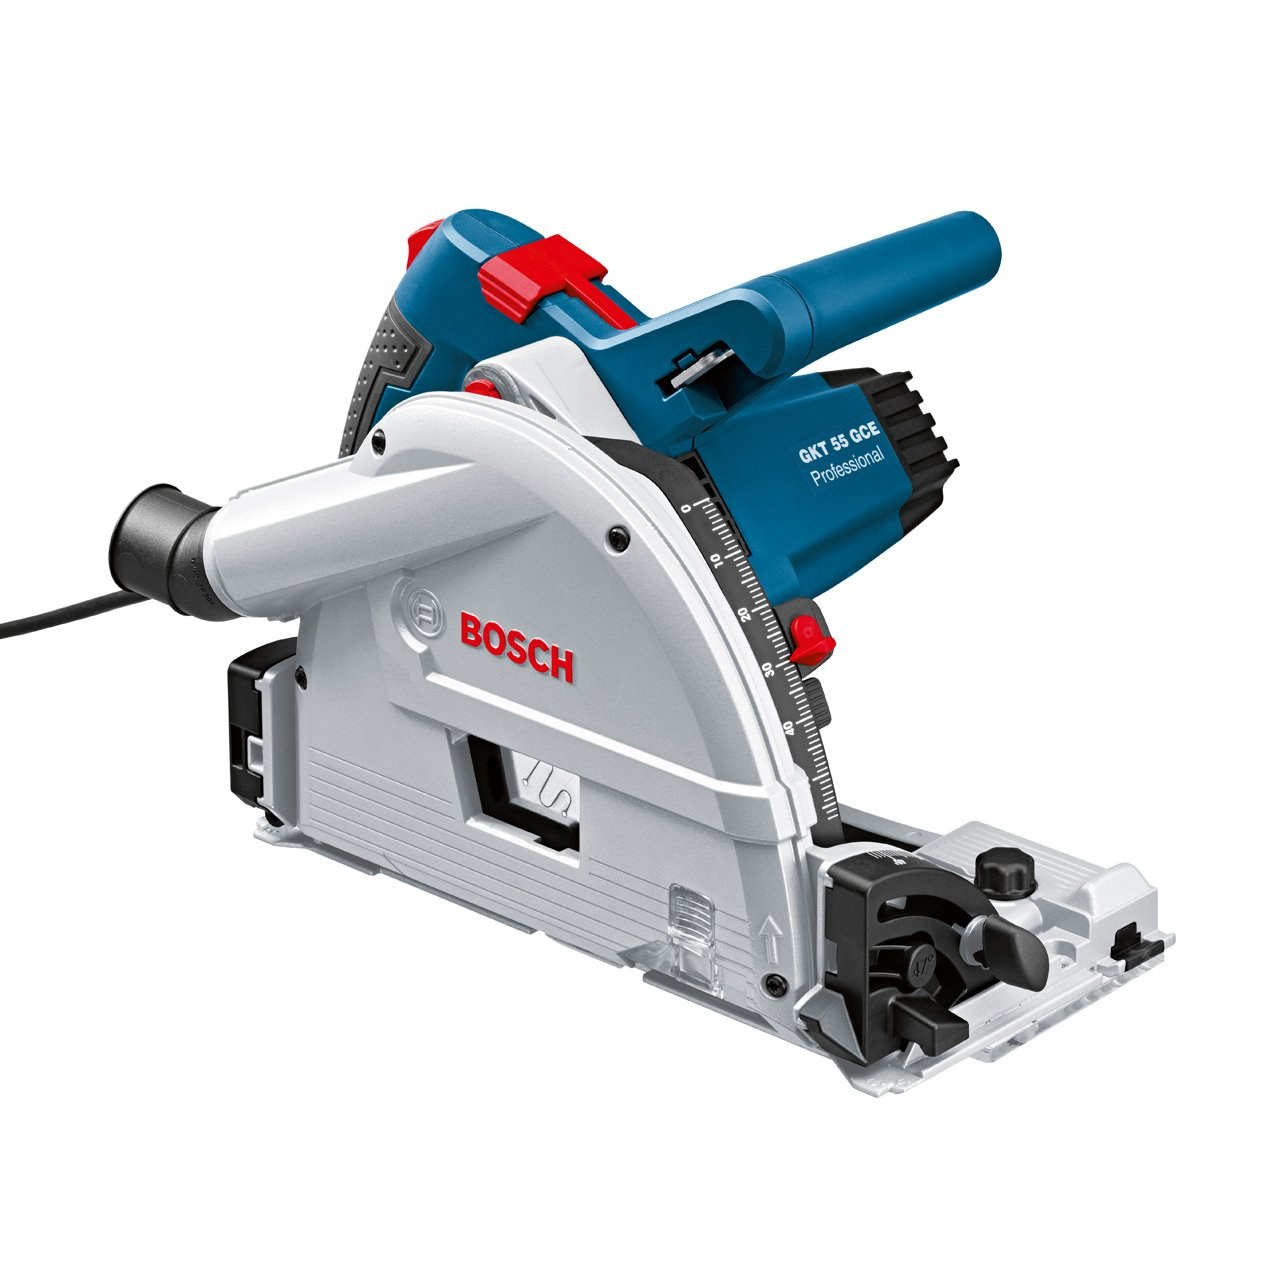 FSN 1600 Bleu Bosch Professional 0601675002 Scie plongeante GKT 55 GCE 1400 W L-BOXX rail non inclus